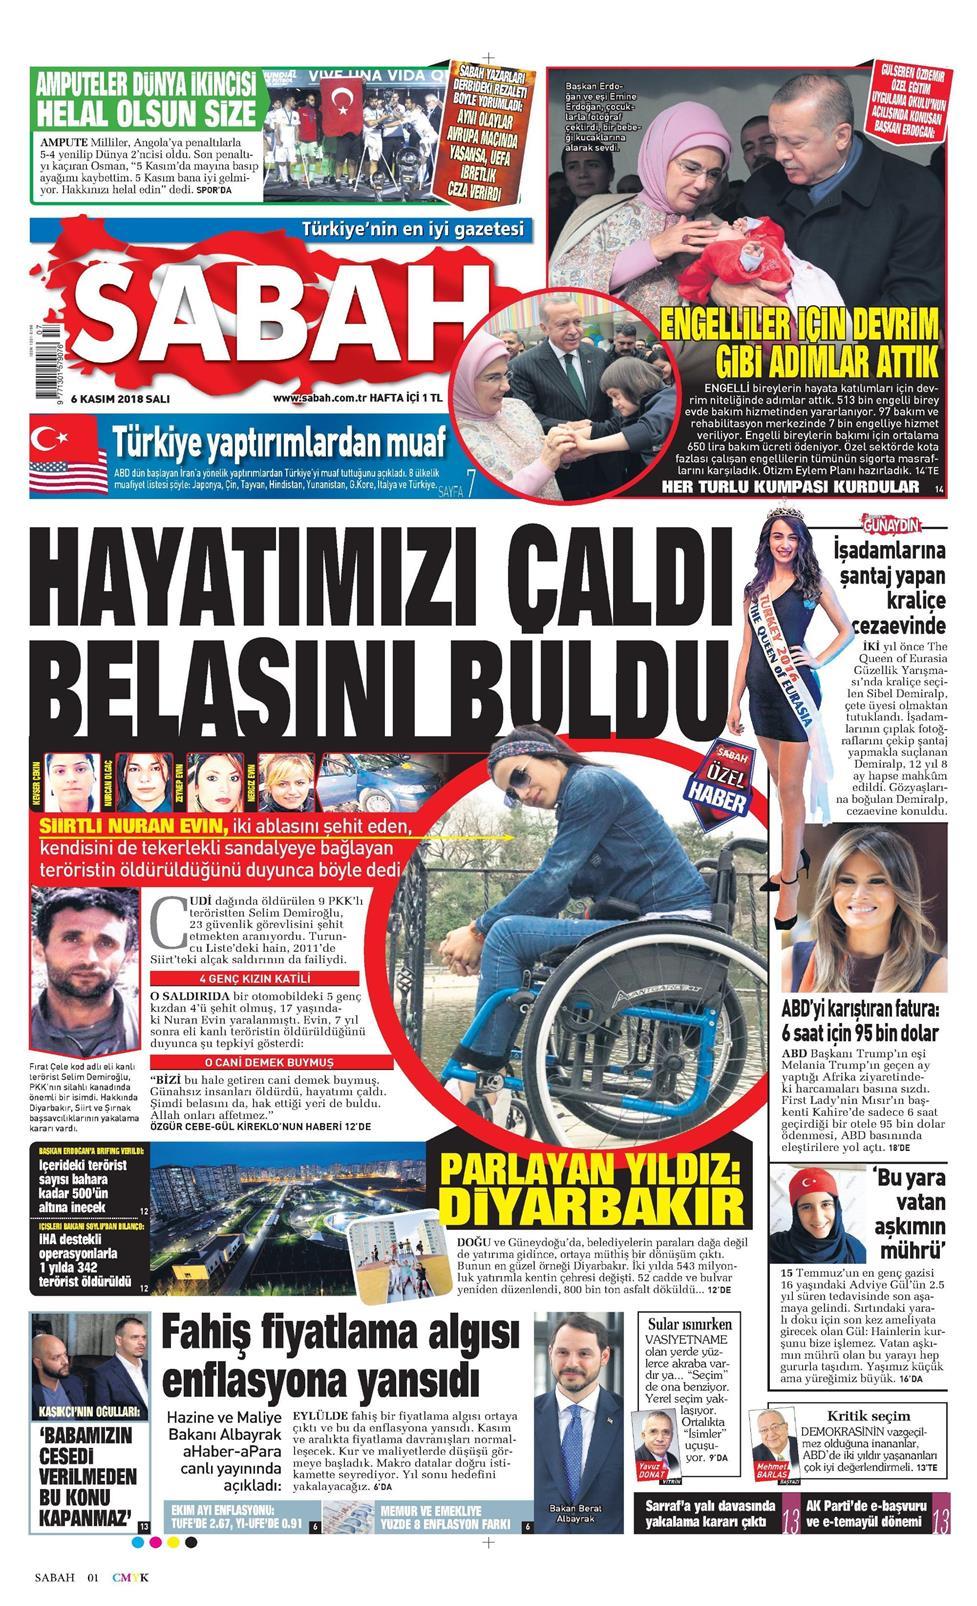 10 Nisan 2019 çarşamba Sabah Gazetesi Manşet